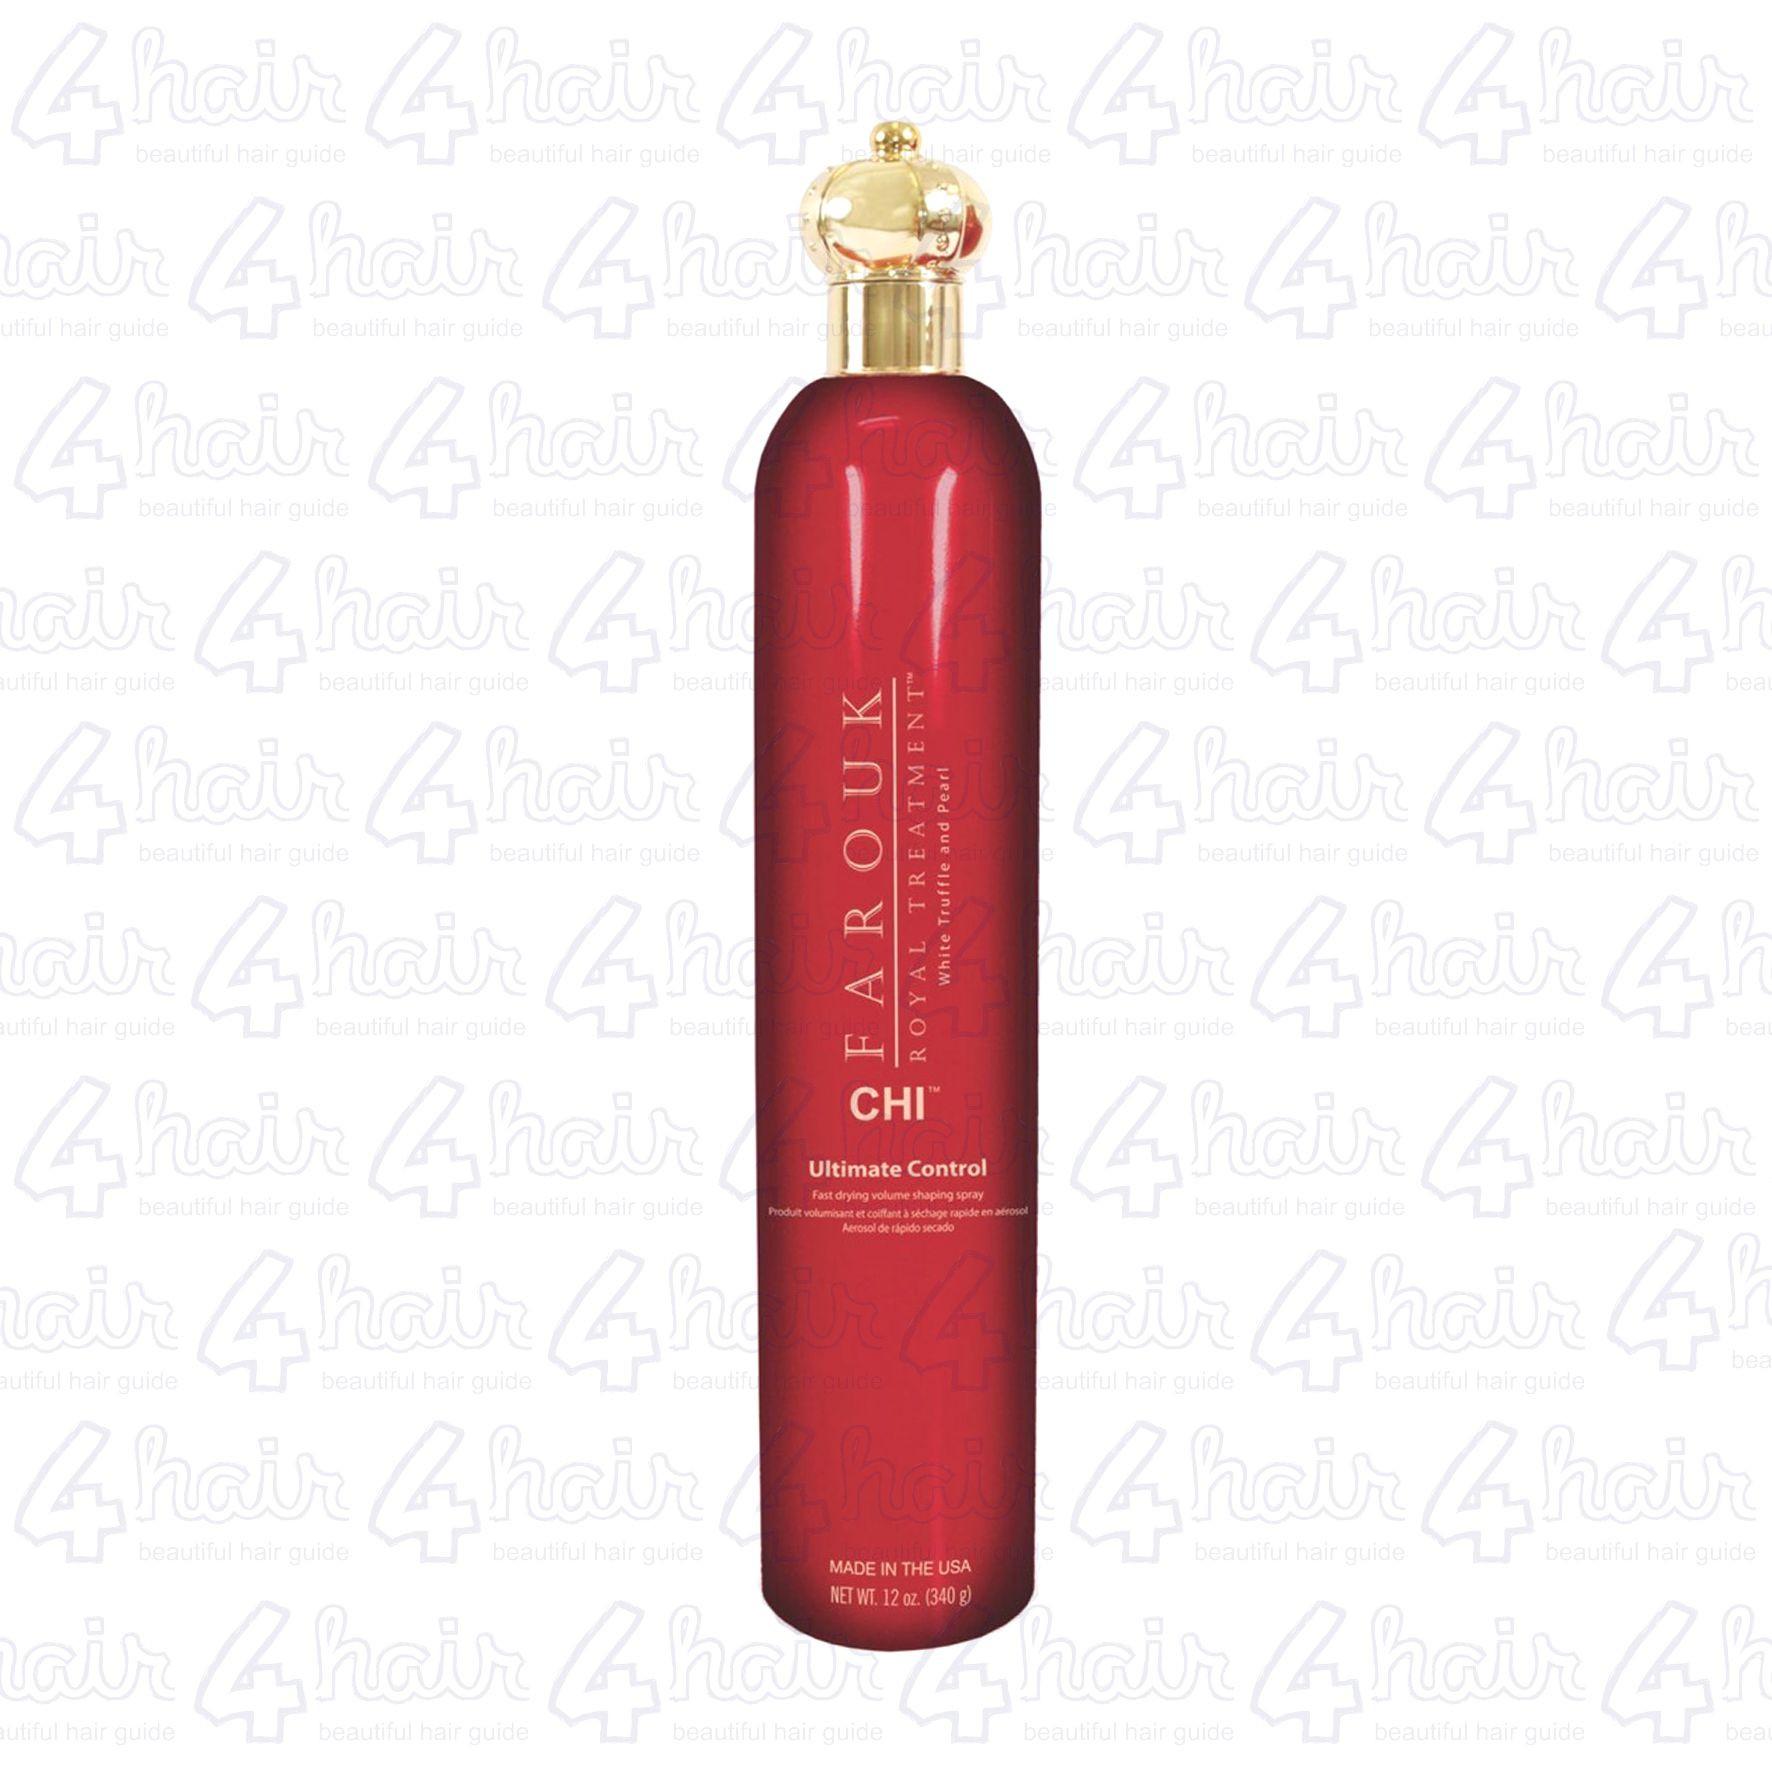 Chi Farouk Royal Treatment Ultimate Control Hair Spray